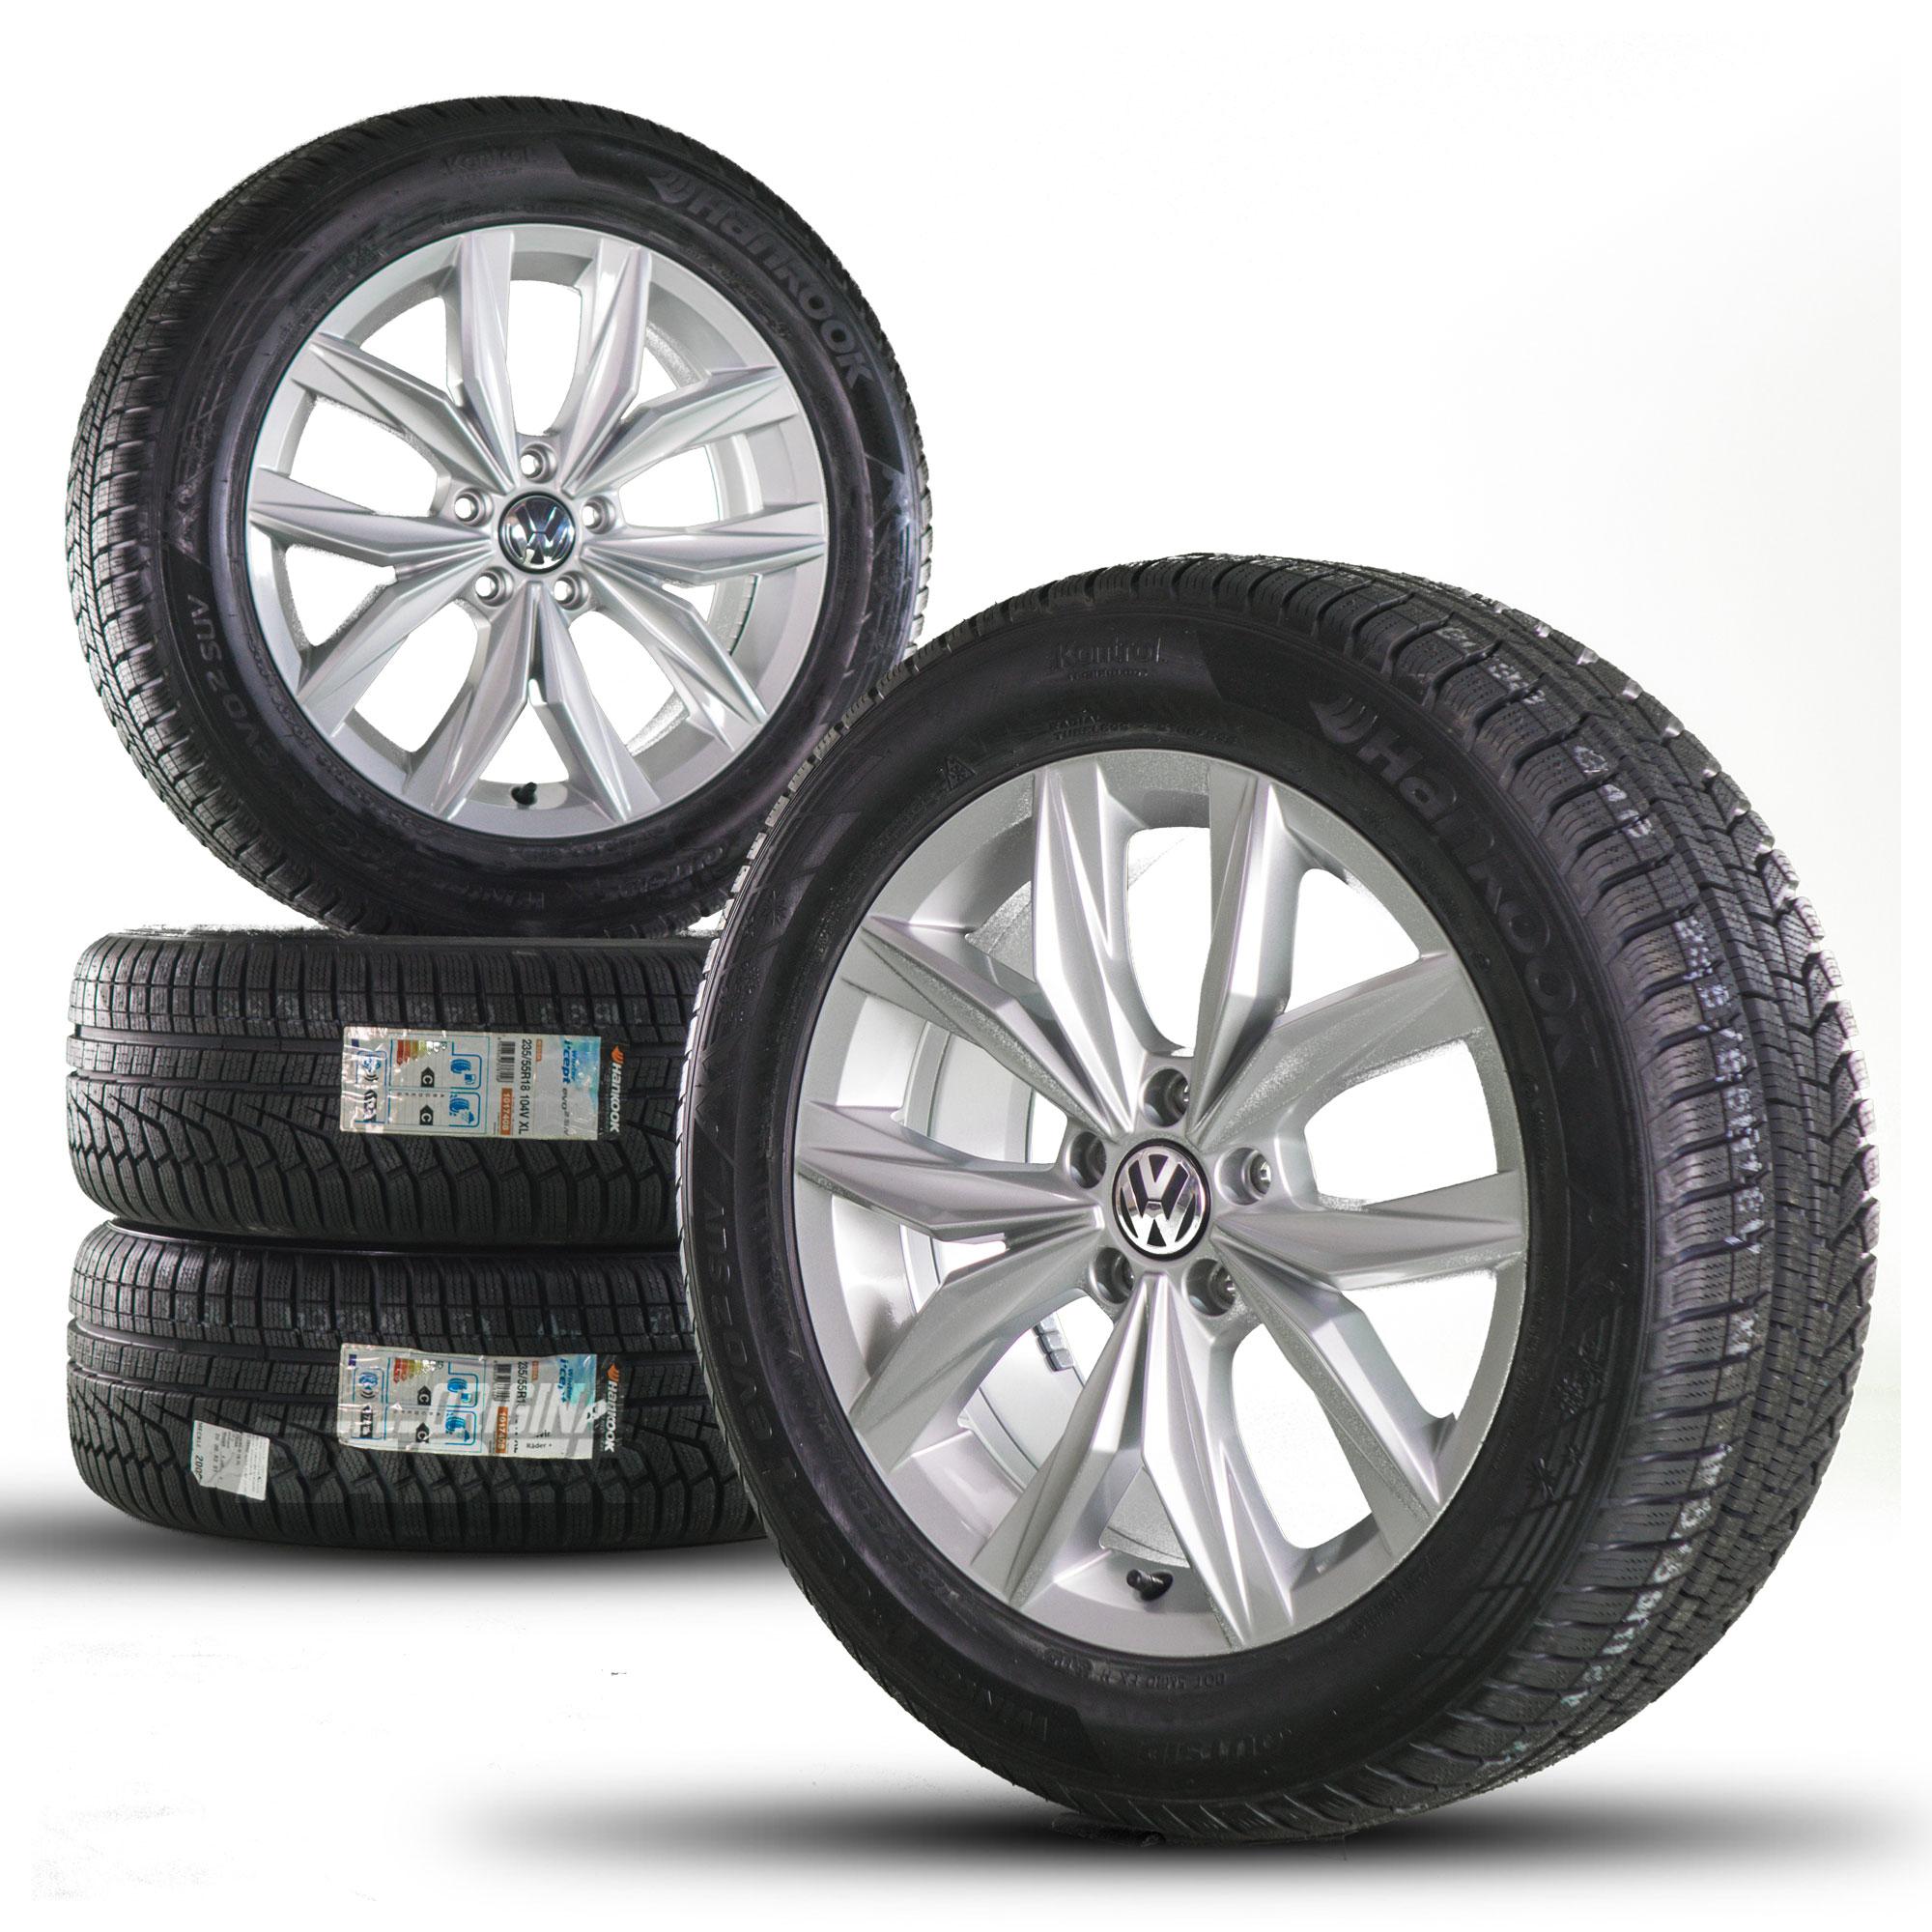 vw 18 zoll jantes tiguan 2 5na en alliage kingston les pneus d 39 hiver roues neuf. Black Bedroom Furniture Sets. Home Design Ideas